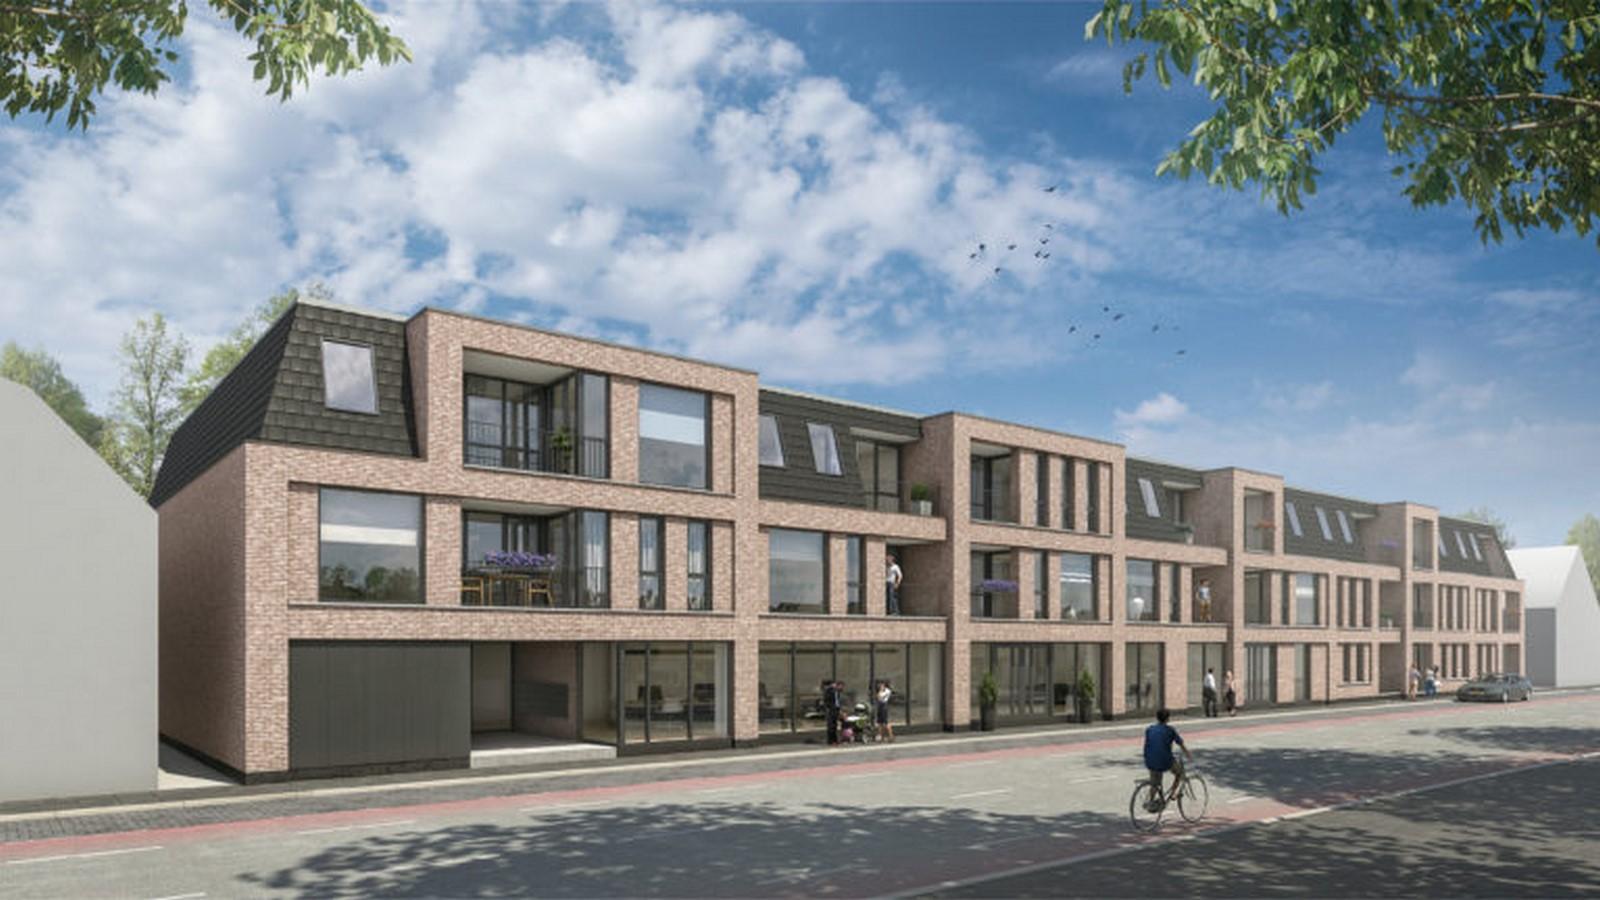 Architects in Breda - Top 55 Architects in Breda - Sheet3